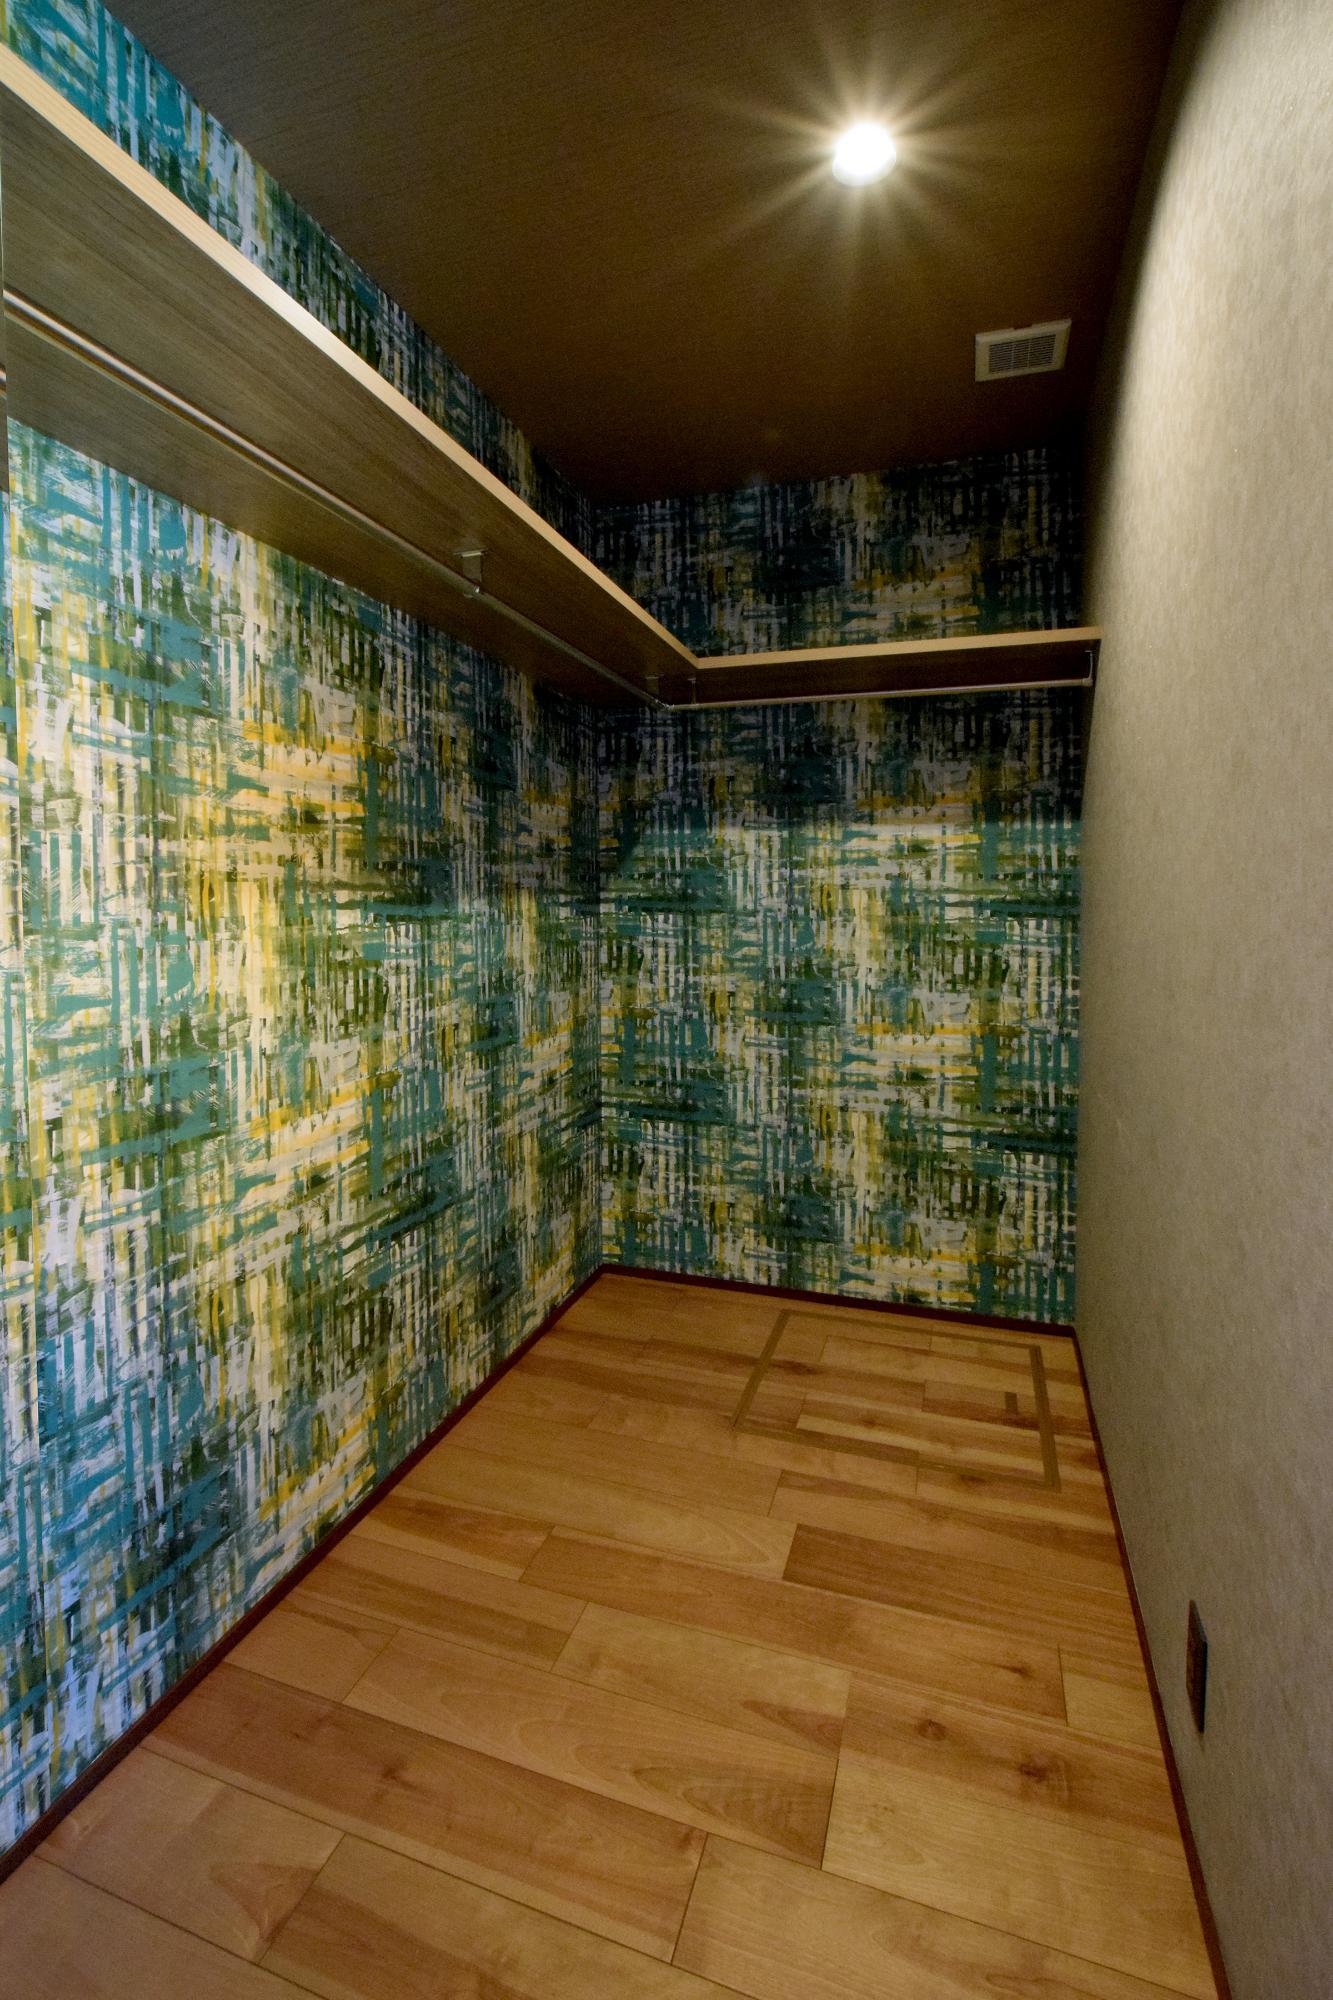 DETAIL HOME(ディテールホーム)「断熱材が2倍の全館空調の家」のシンプル・ナチュラル・モダンな収納スペースの実例写真